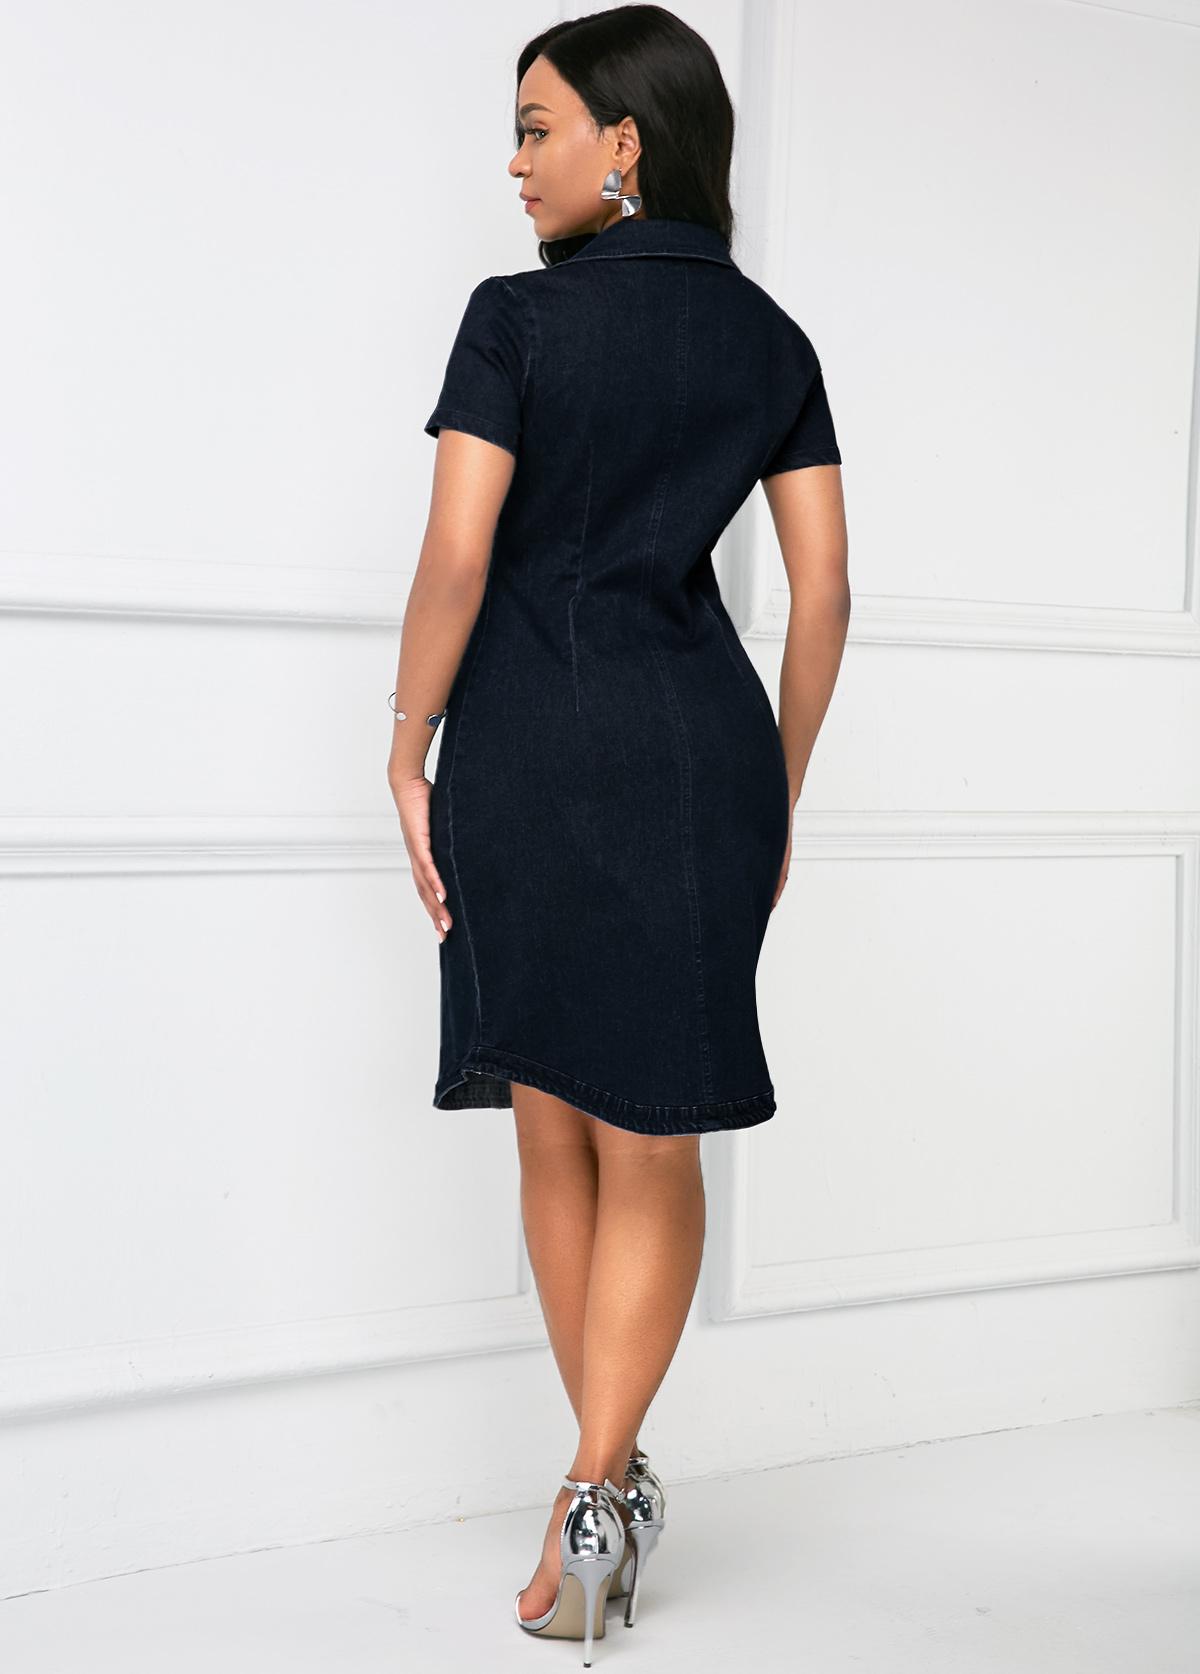 Denim Button Up Chest Pocket Dress